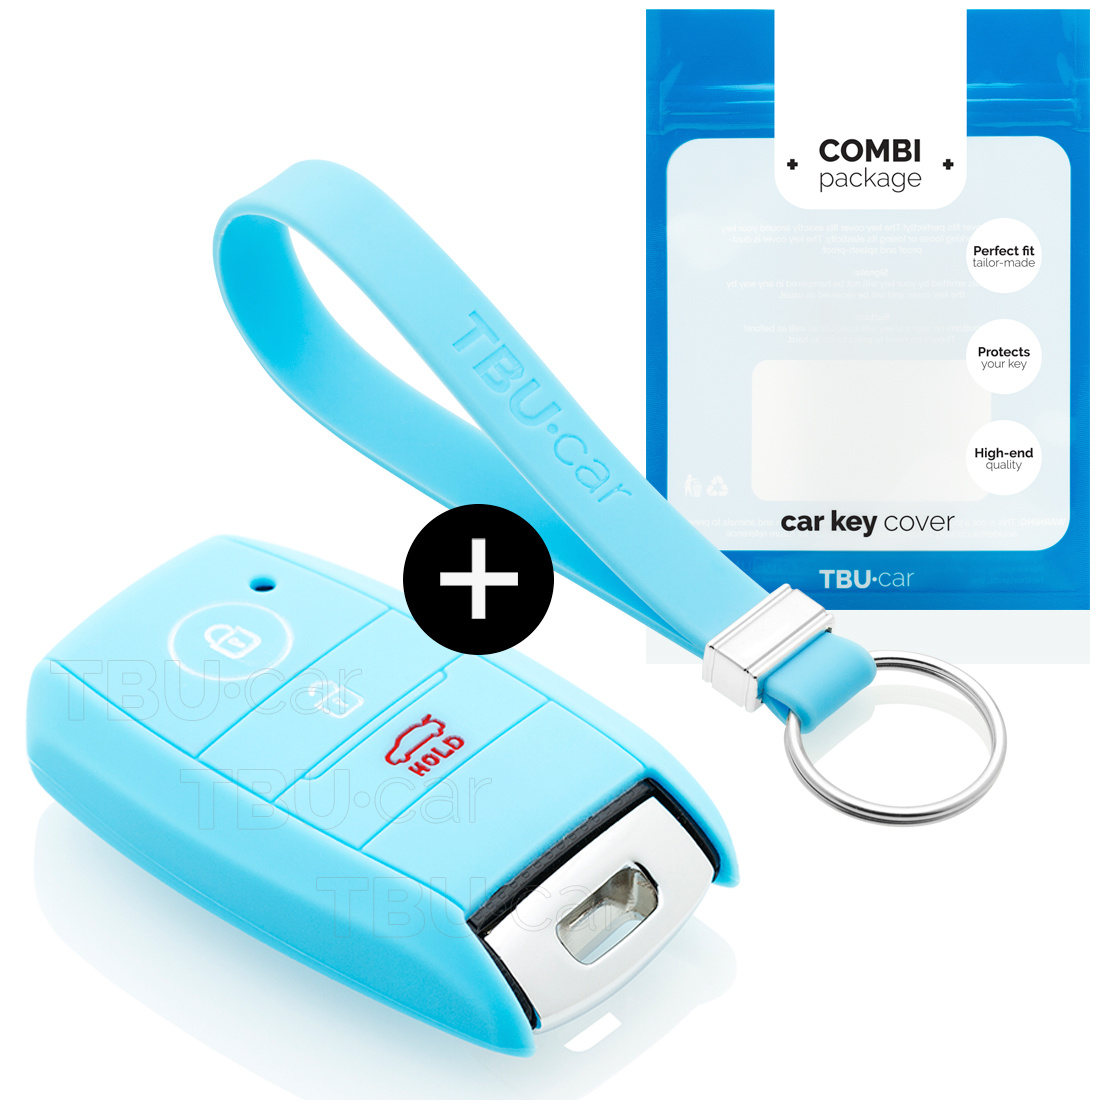 Kia Car key cover - Silicone Protective Remote Key Shell - FOB Case Cover - Light Blue